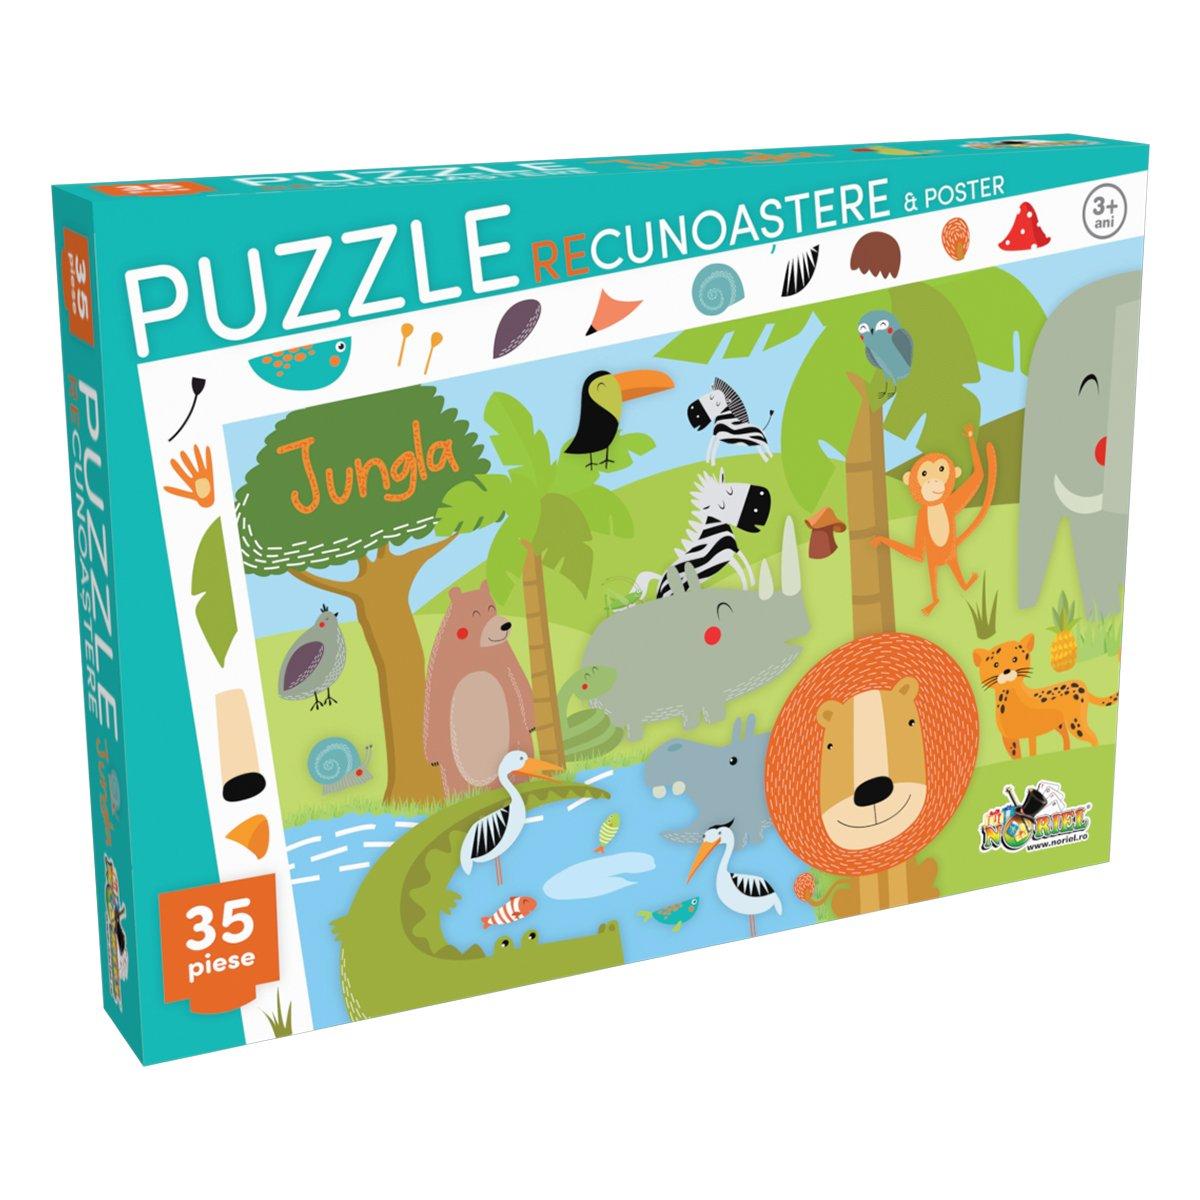 puzzle noriel - recunoastere jungla (35 piese)